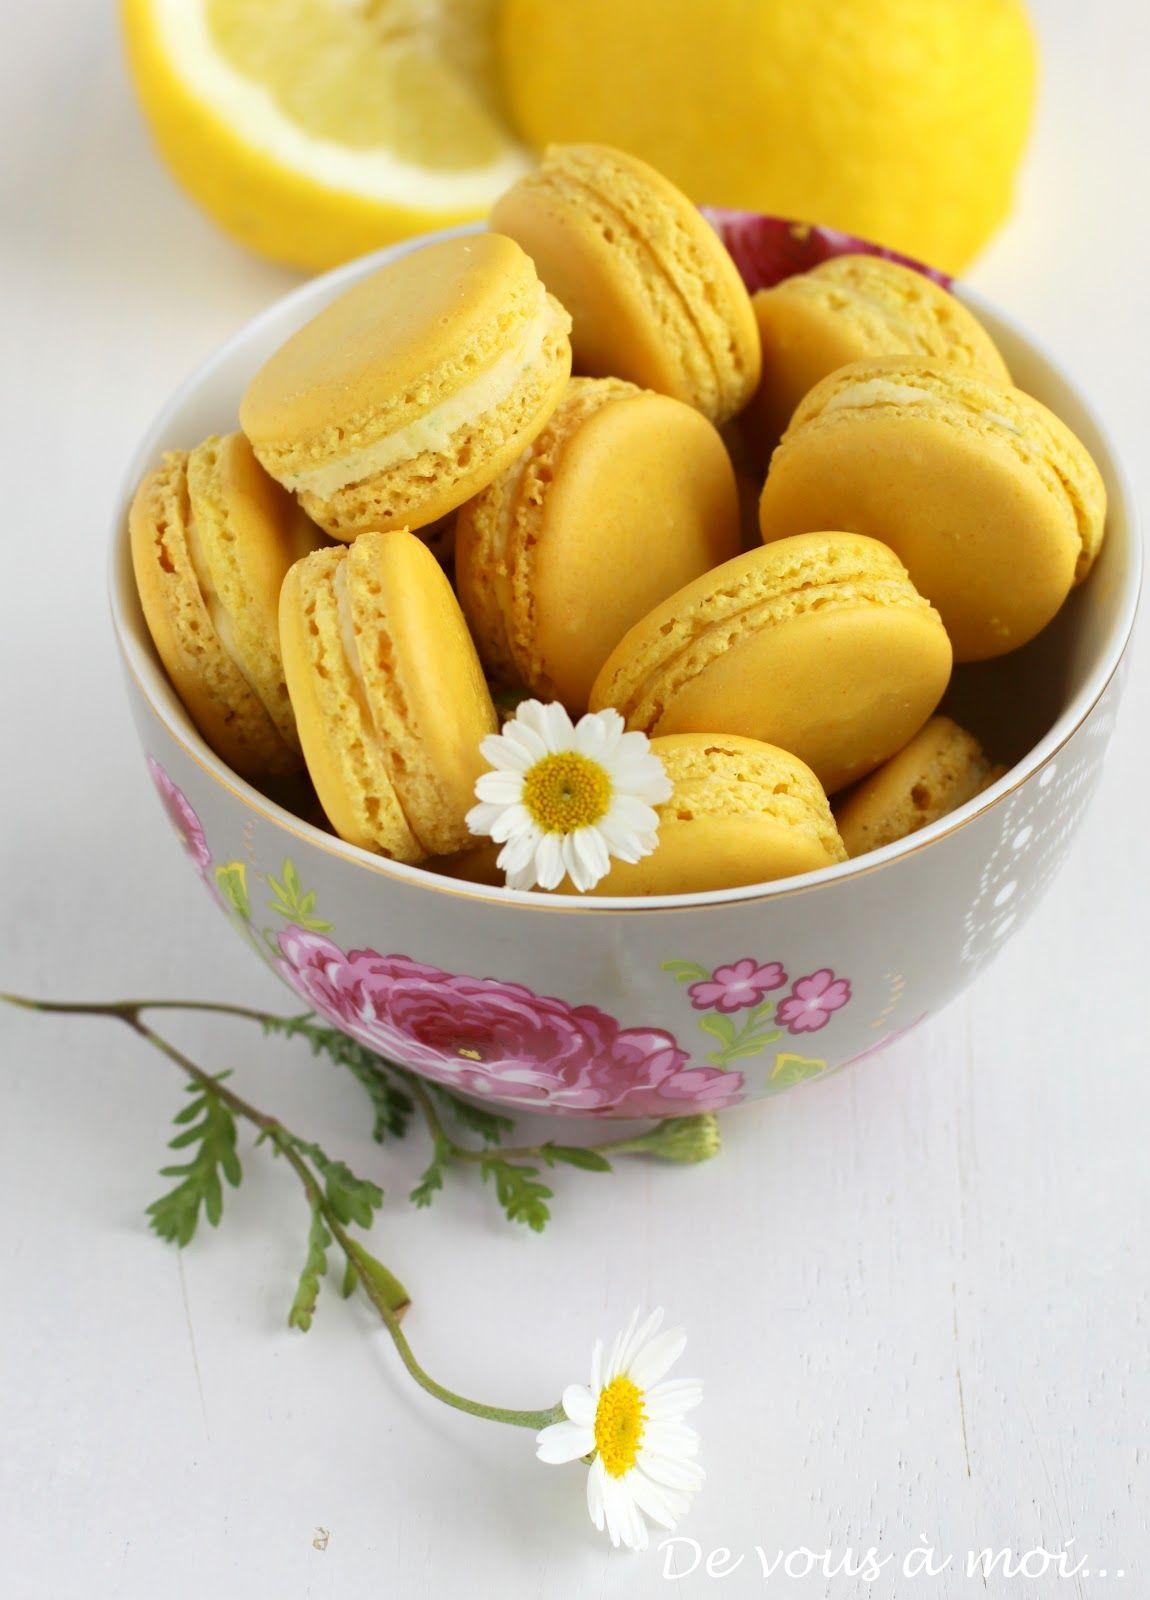 Lemon Macarons #macarons #macaroons